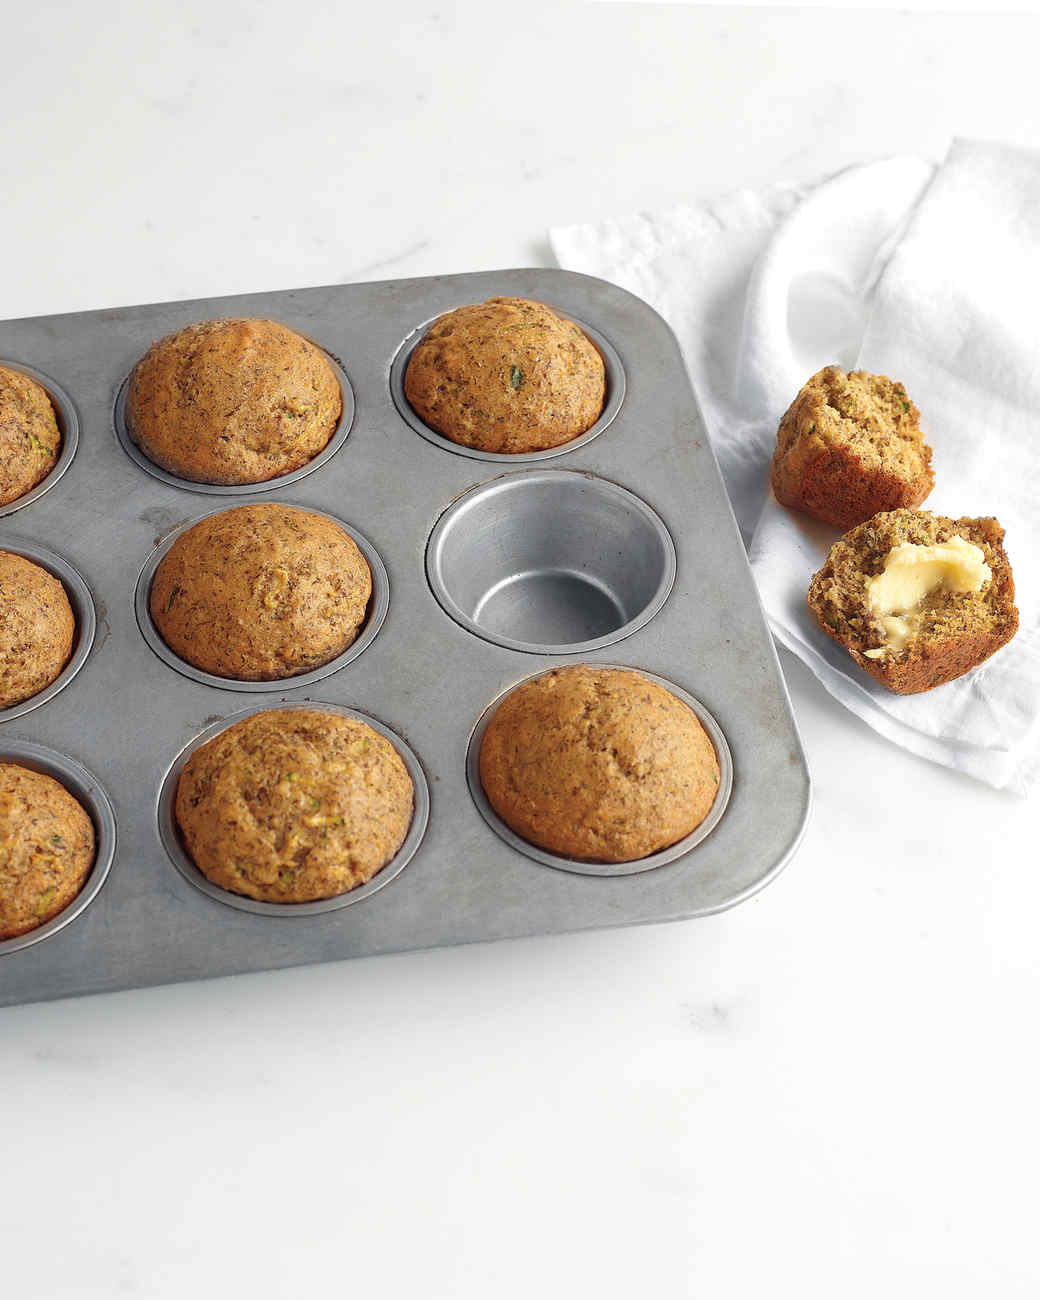 zucchini-flax-muffins-0911med107344.jpg